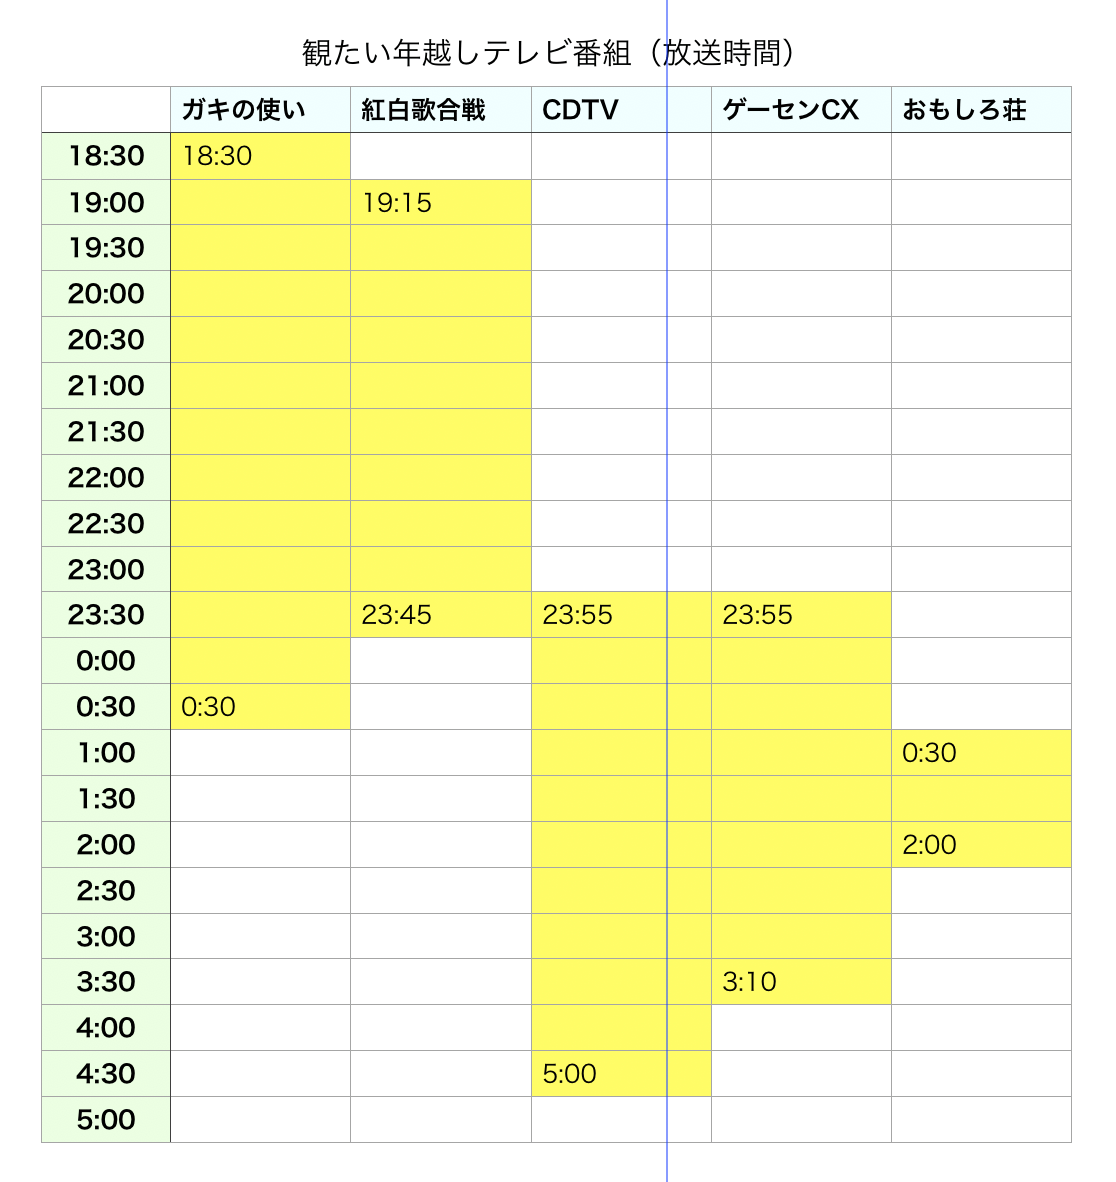 2018-2019-nye-tvpg